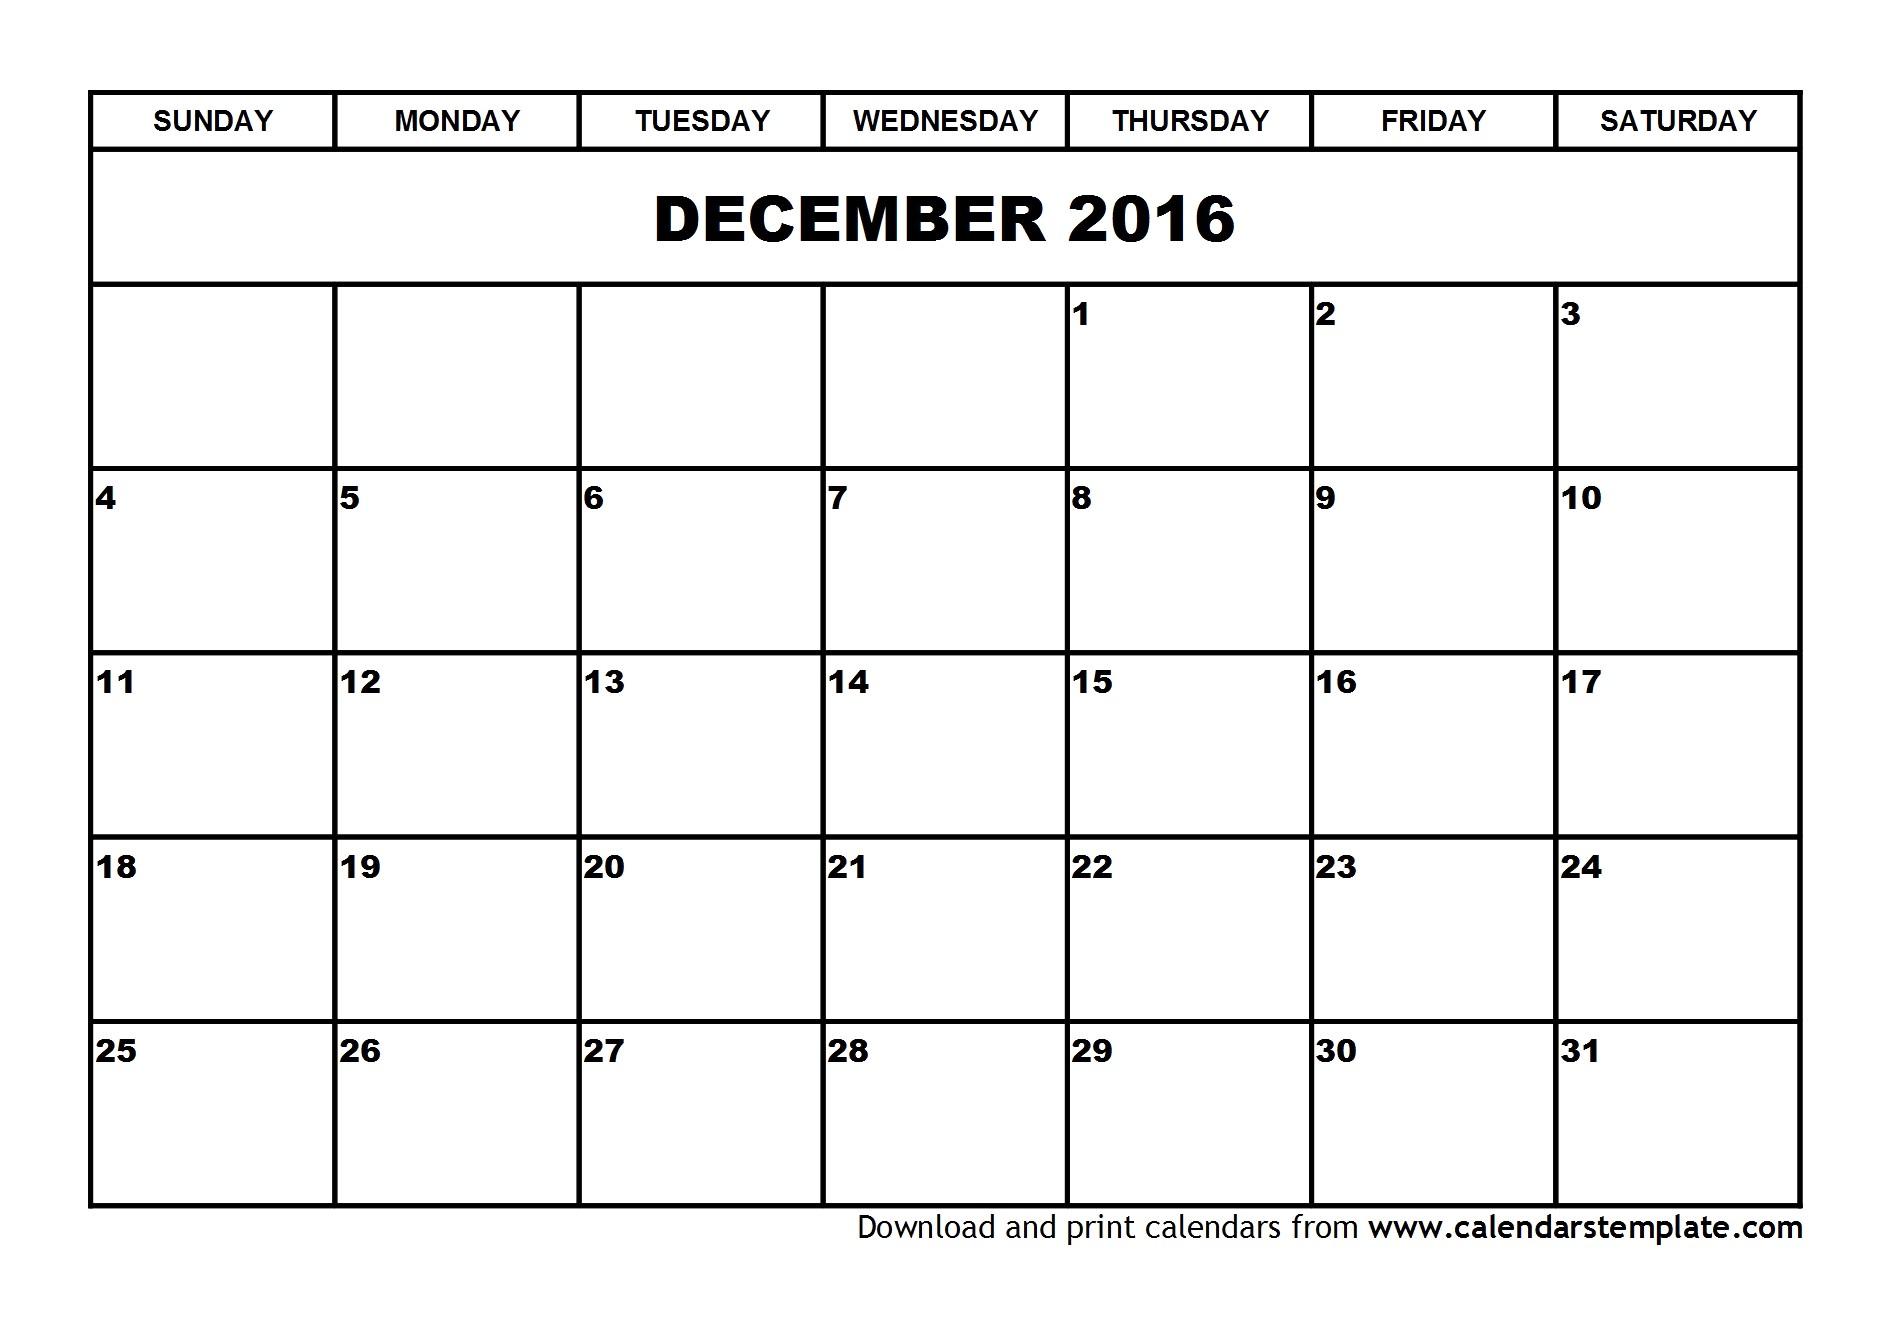 Free Printable December Calendar 2016   Jcreview with Blank Dec Calendar Printable